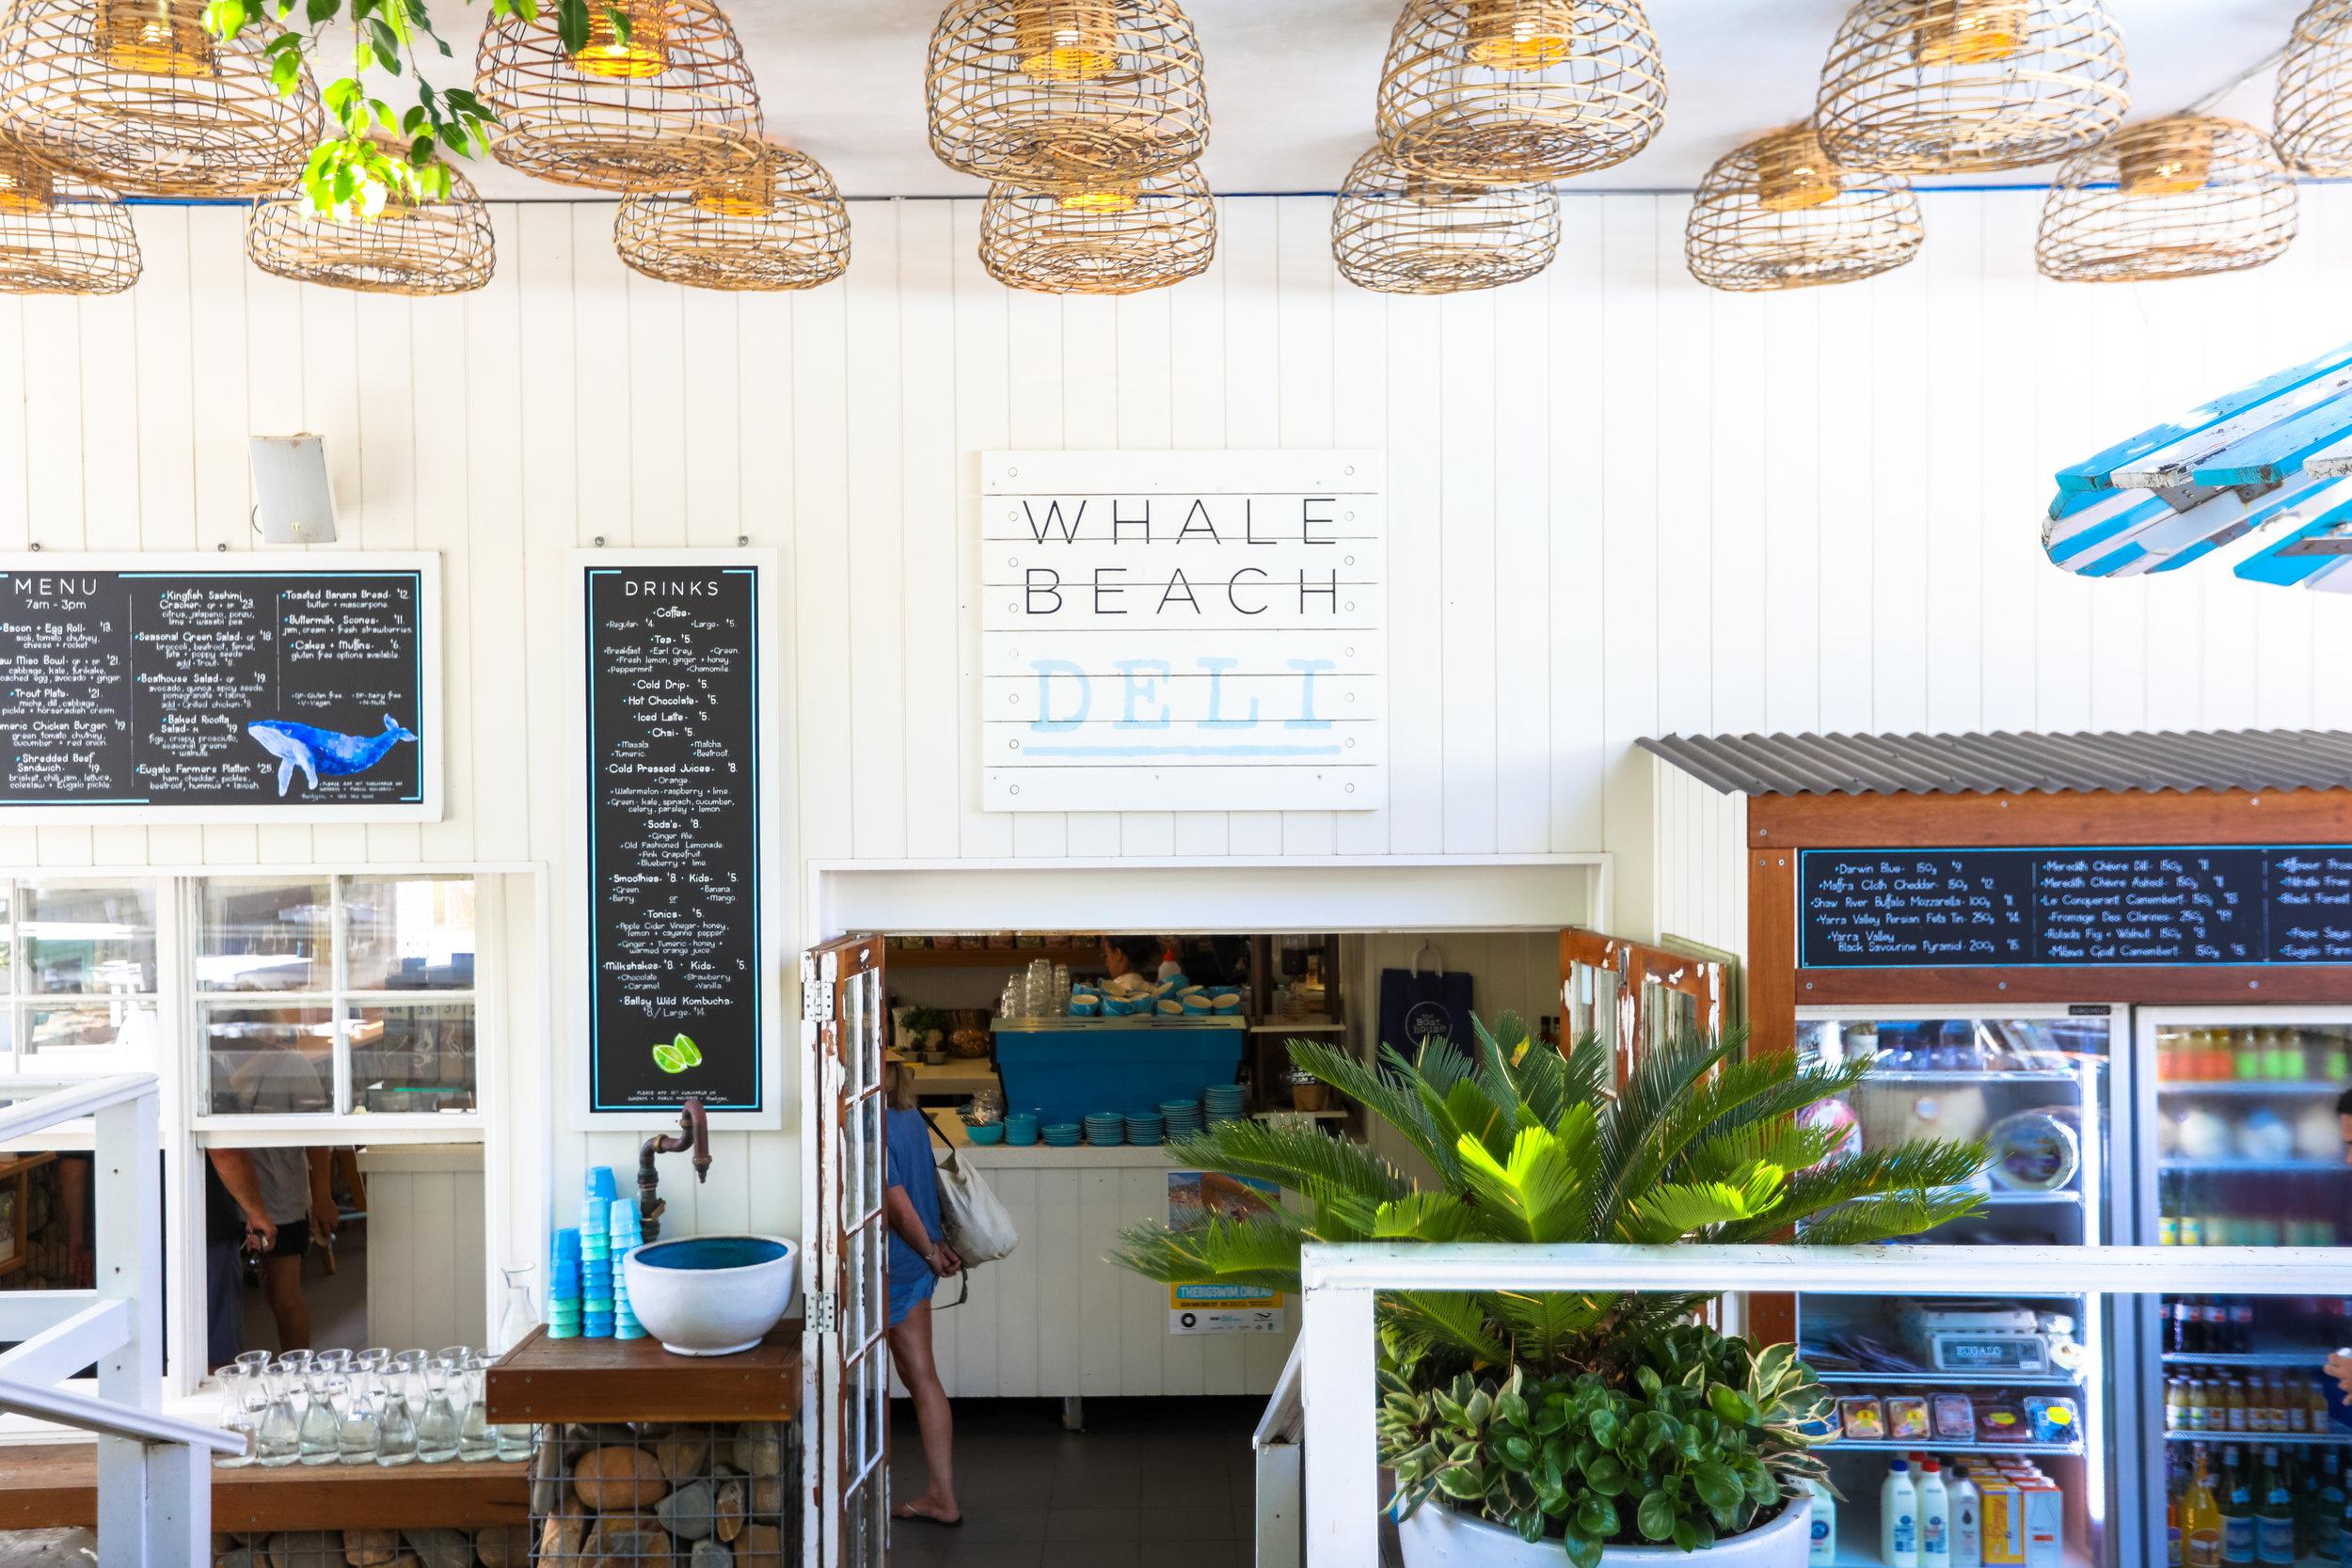 The Whale Beach Deli MenuN